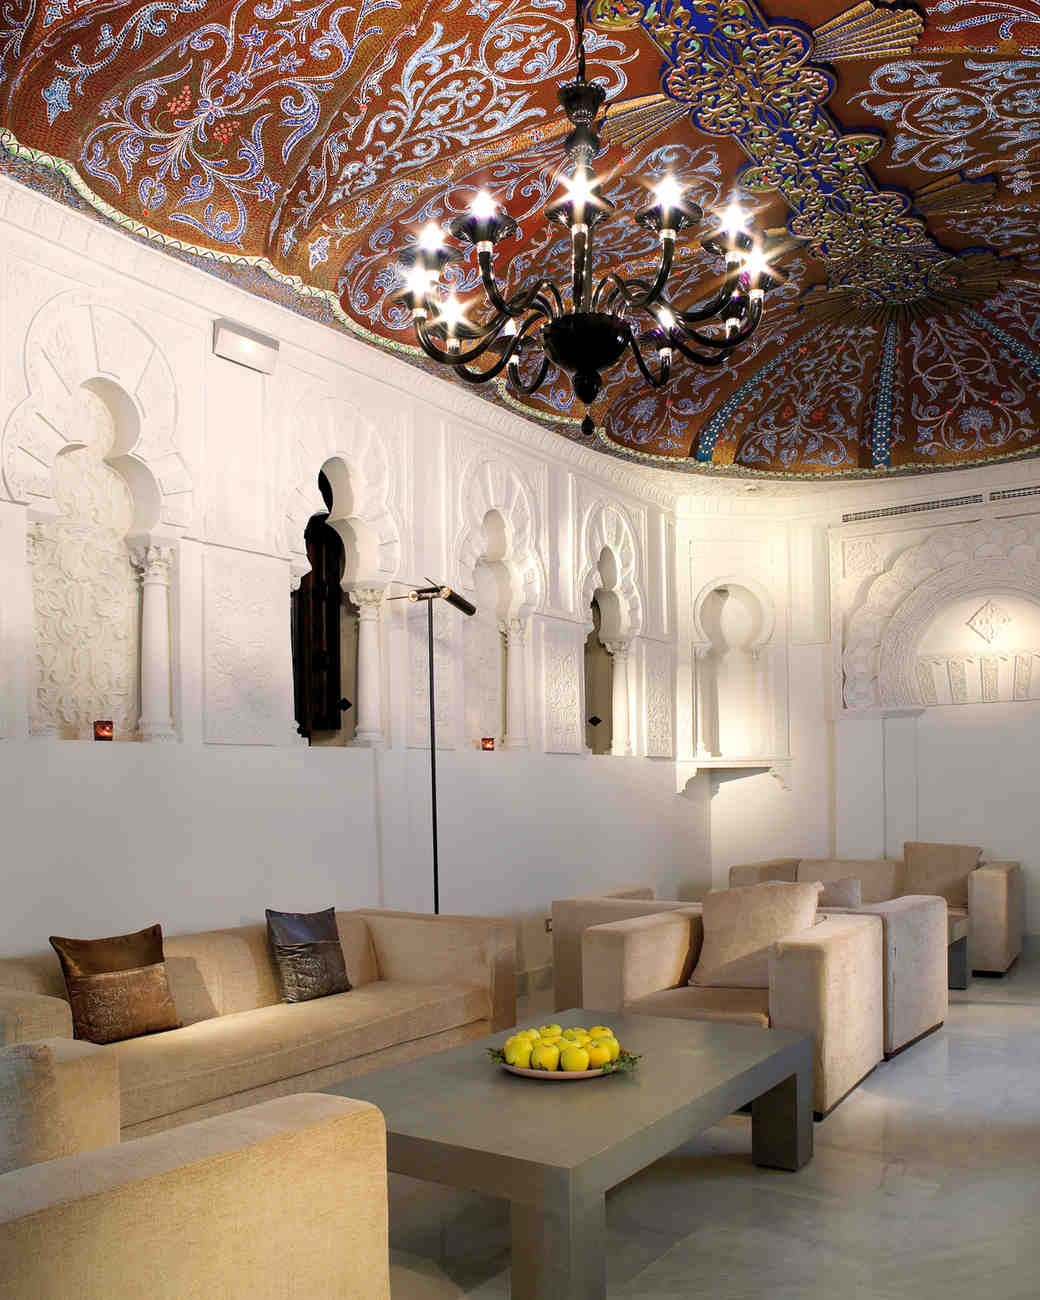 mr-mrs-smith-travel-hotels-wd0413-hotel-bailio-salon.jpg